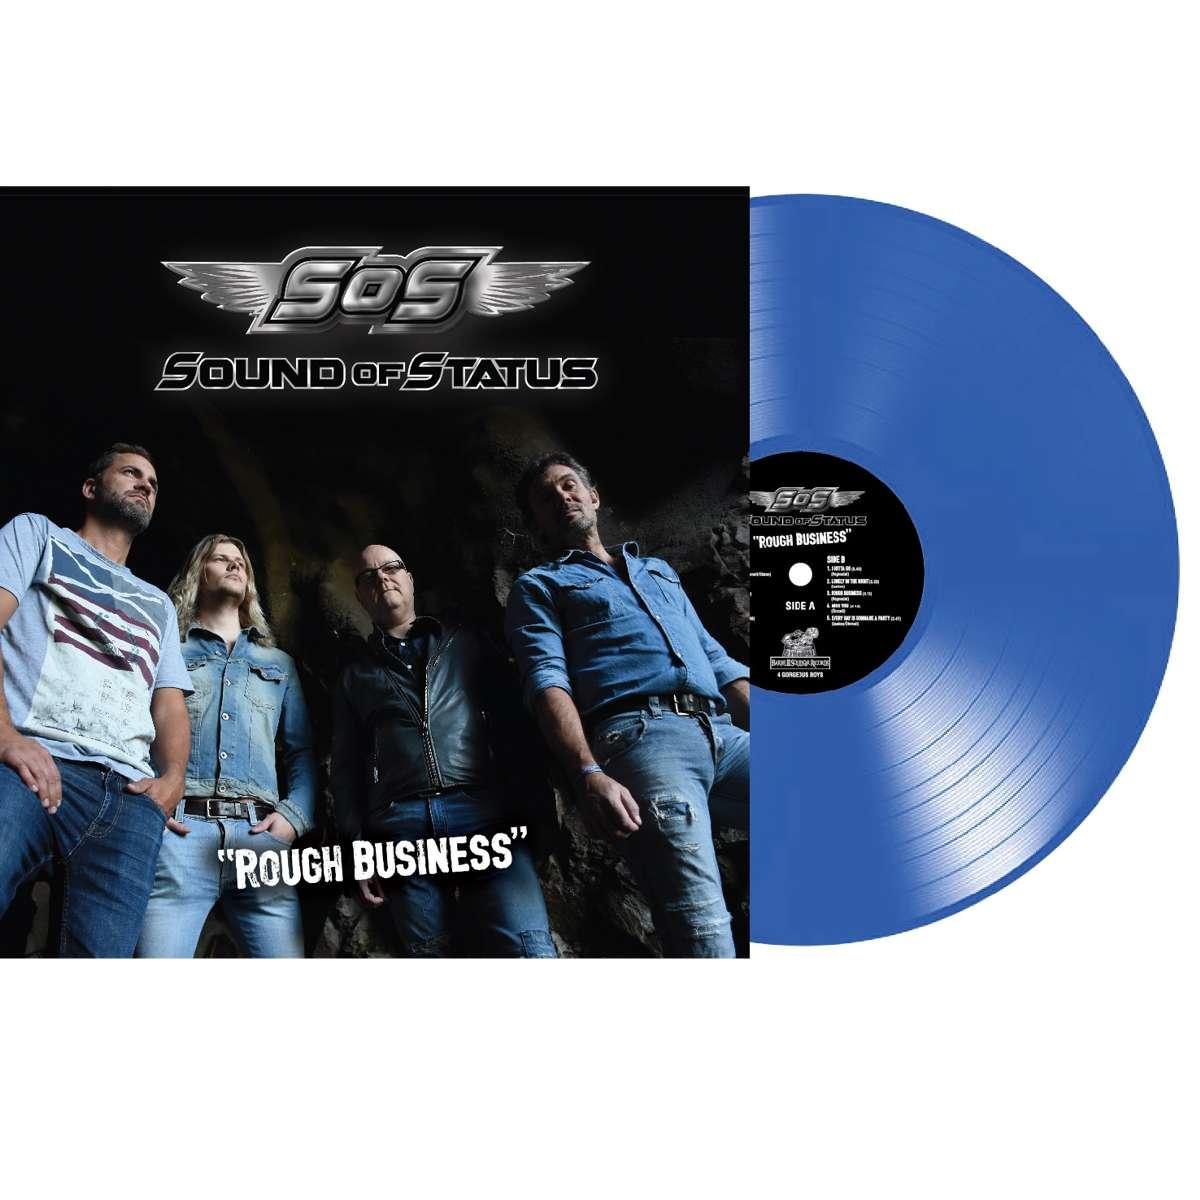 Sound Of Status - Rough Business - BLUE vinyl LP - Barrel And Squidger Records